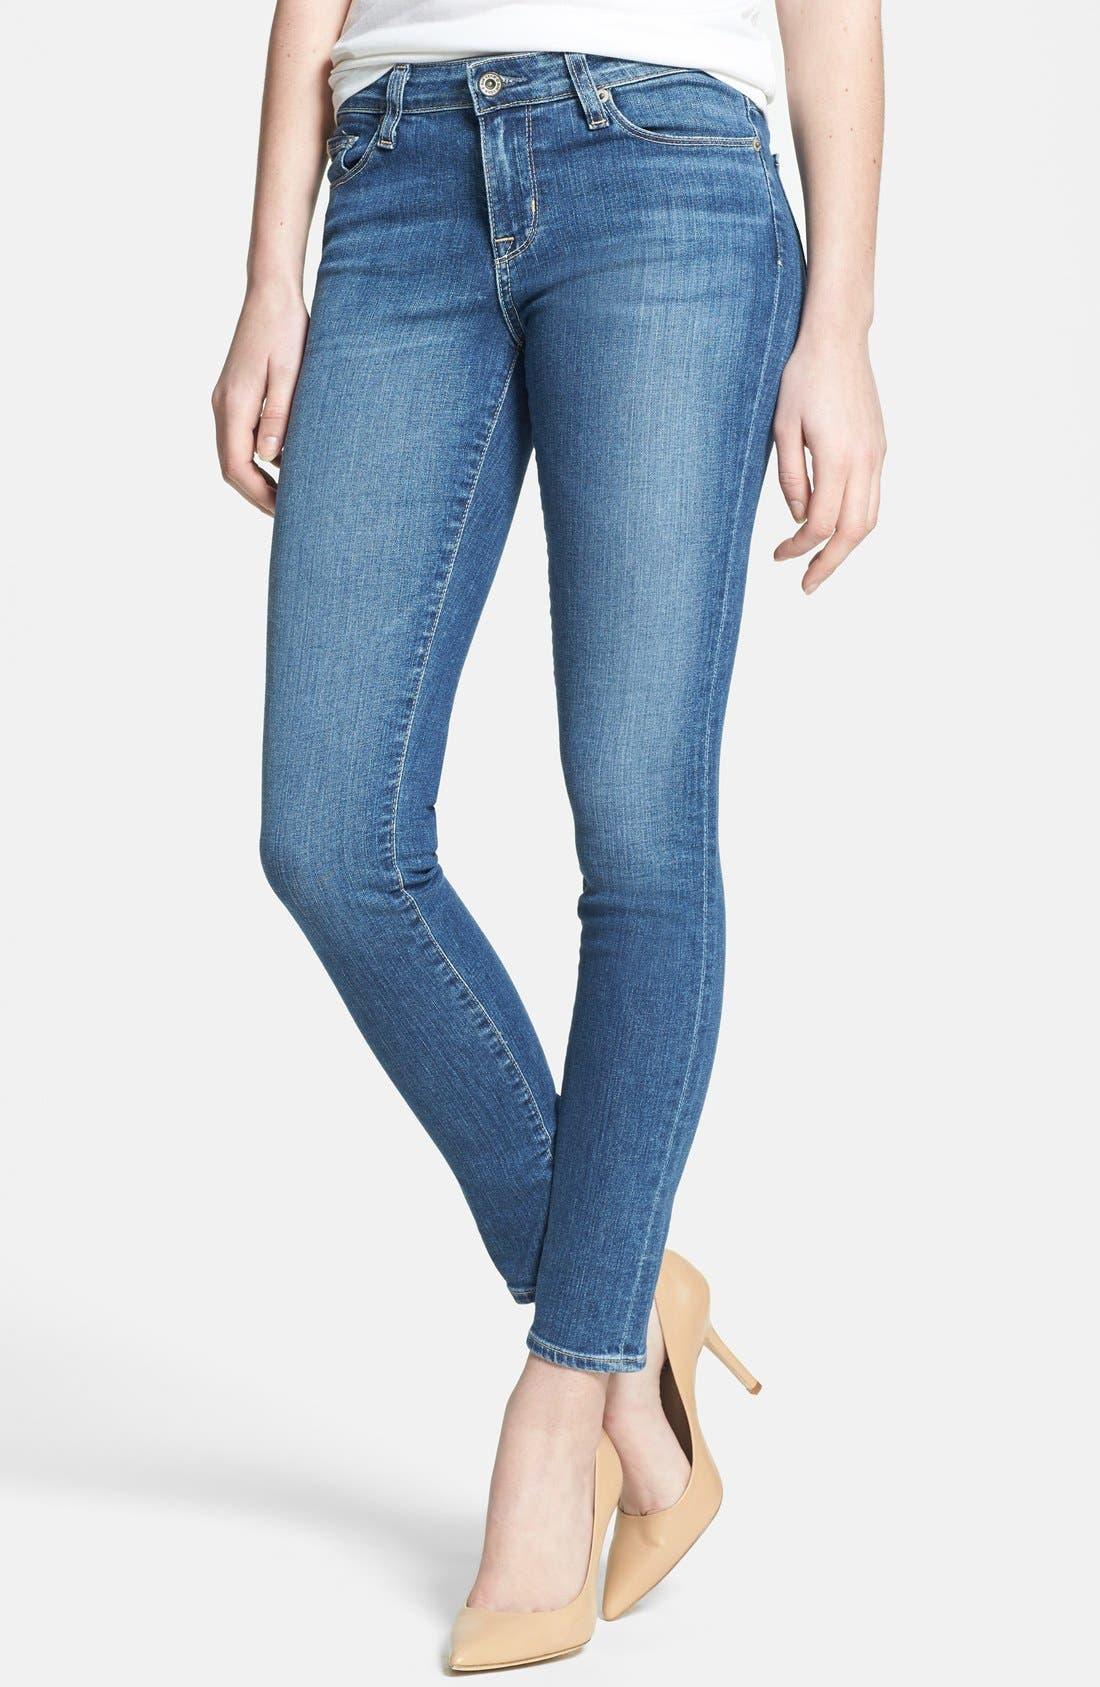 Alternate Image 1 Selected - Big Star 'Alex' Stretch Skinny Jeans (Holly Medium)